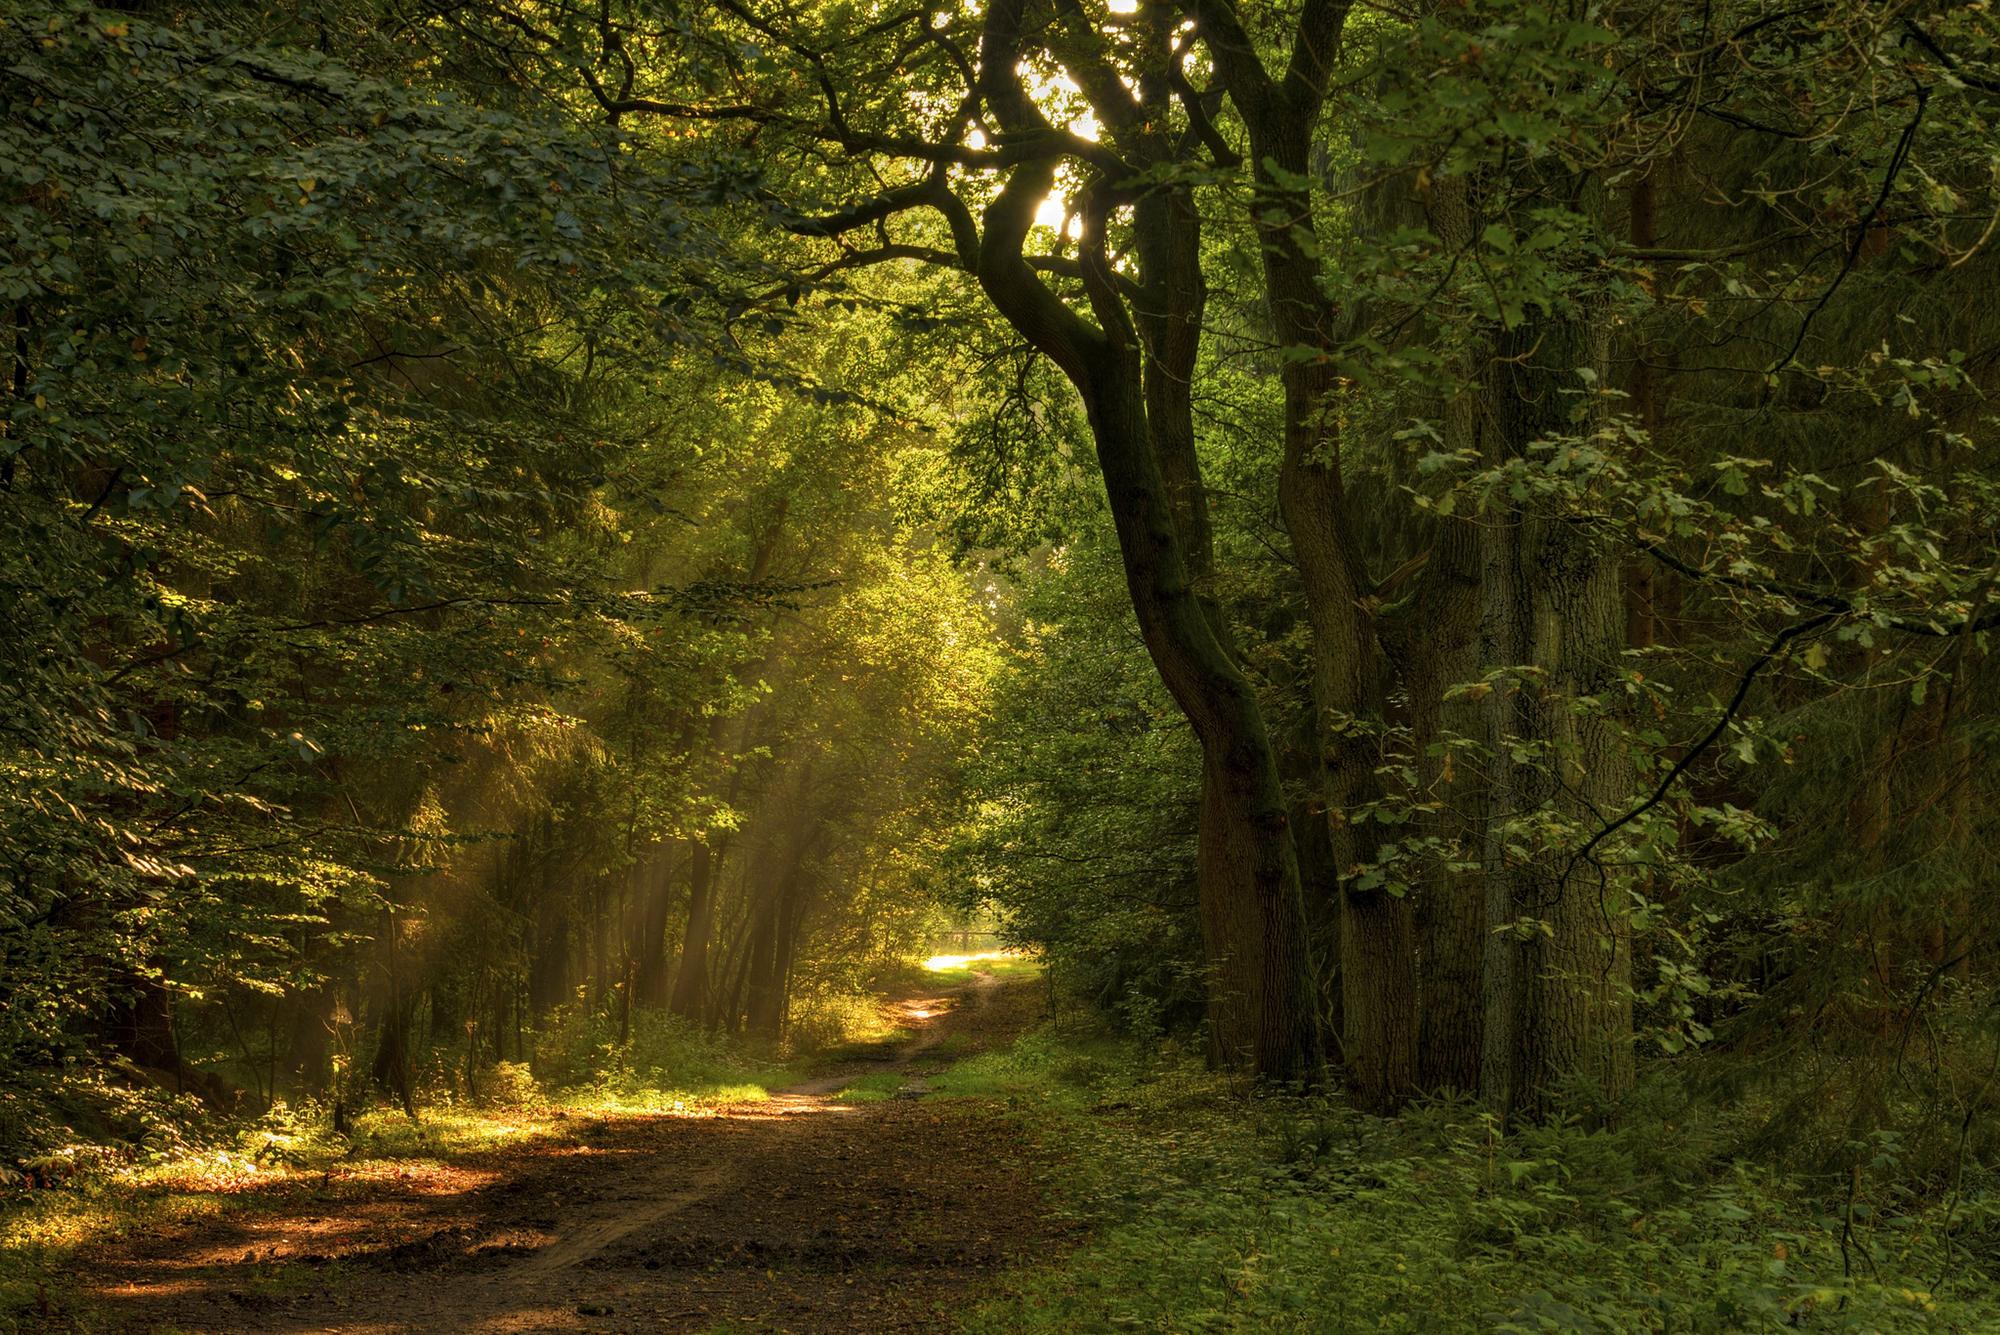 лес лучи солнце дорога загрузить